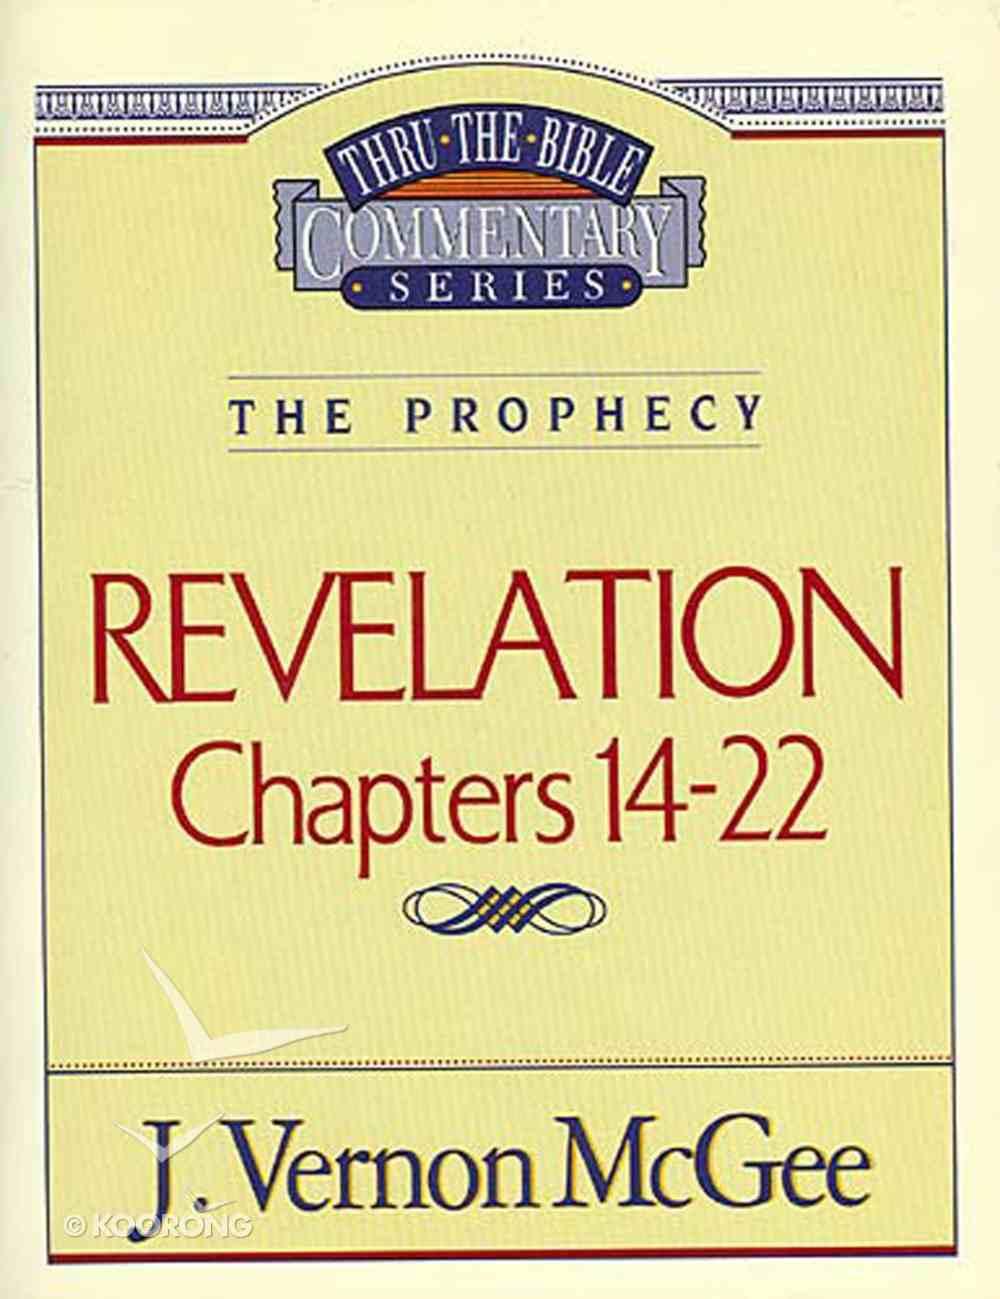 Thru the Bible #60: Revelation (#60 in Thru The Bible New Testament Series) eBook